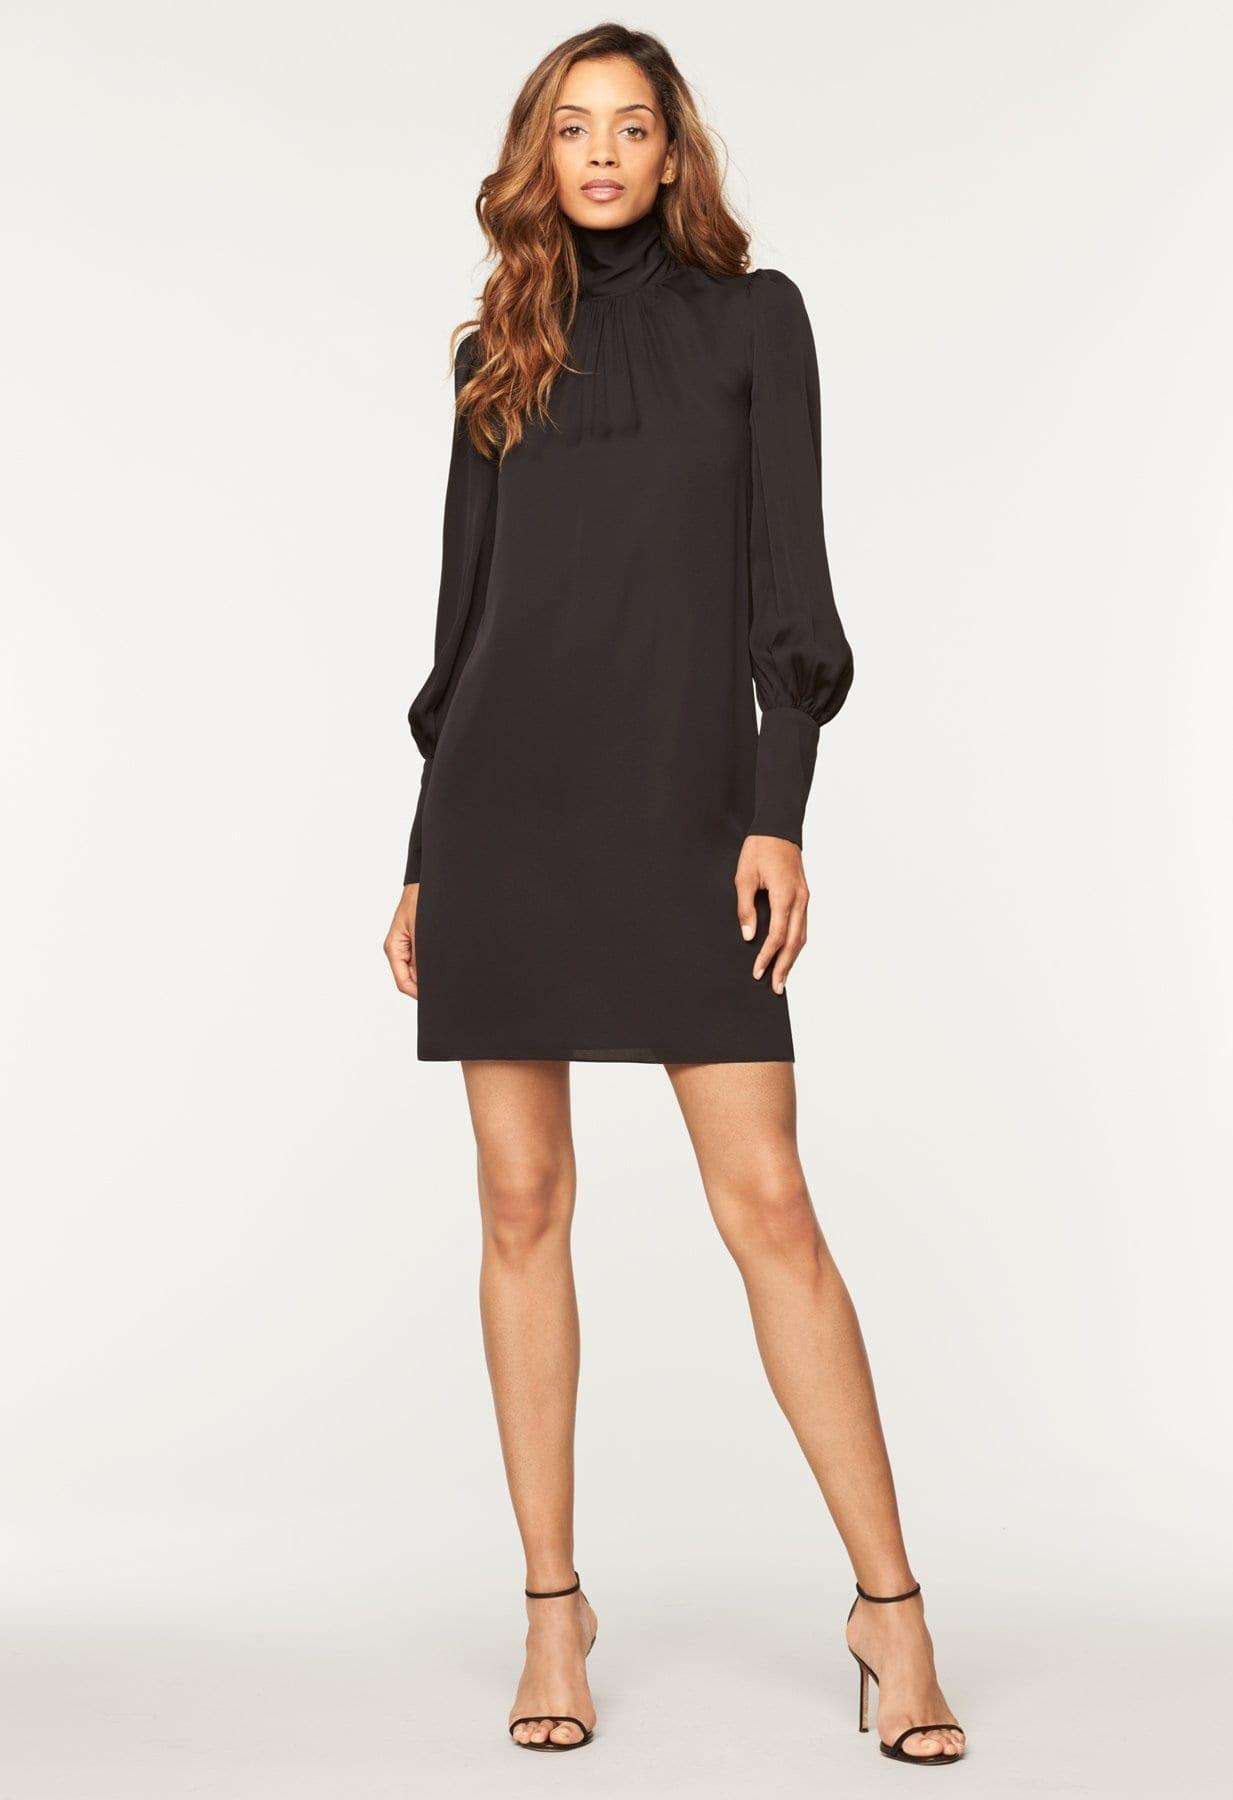 MILLY Stretch Silk Annabel Black Dress